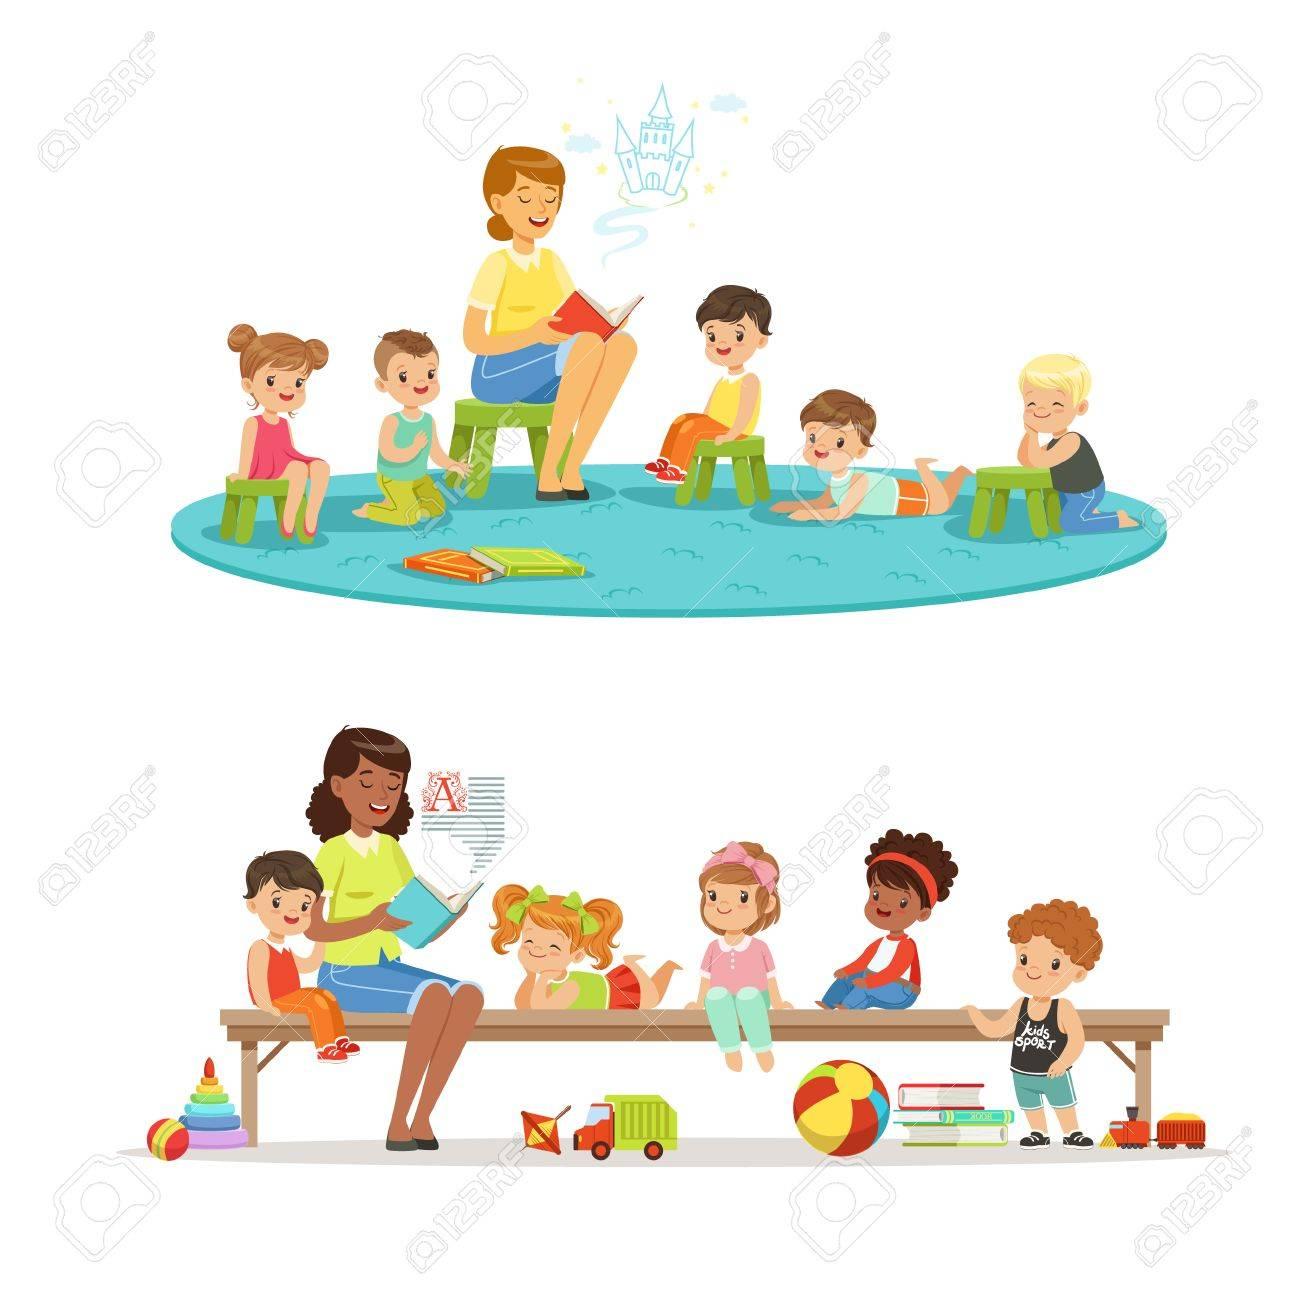 Group of preschool kids and teacher. Teacher reading for kids in the kindergarten. Cartoon detailed colorful Illustrations - 74811225